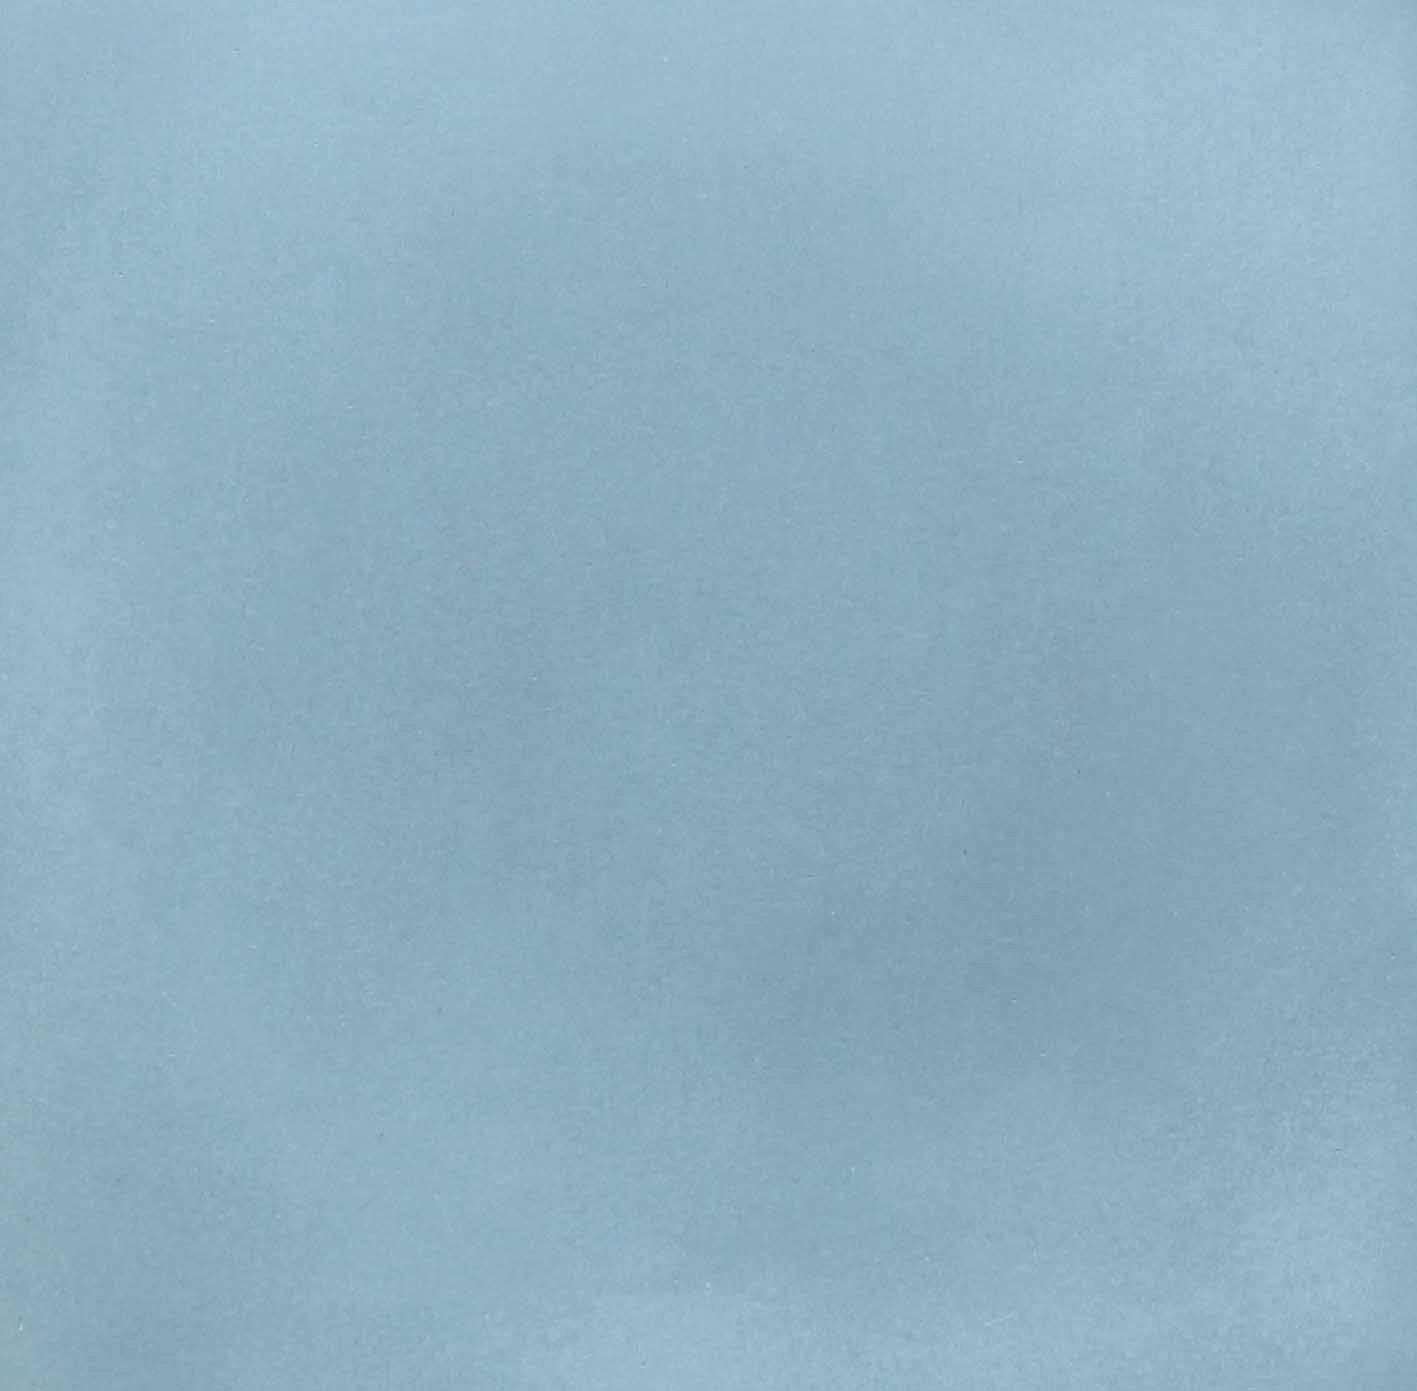 Wandfarbe Helles Blaugrau: Farbe Blau Grau